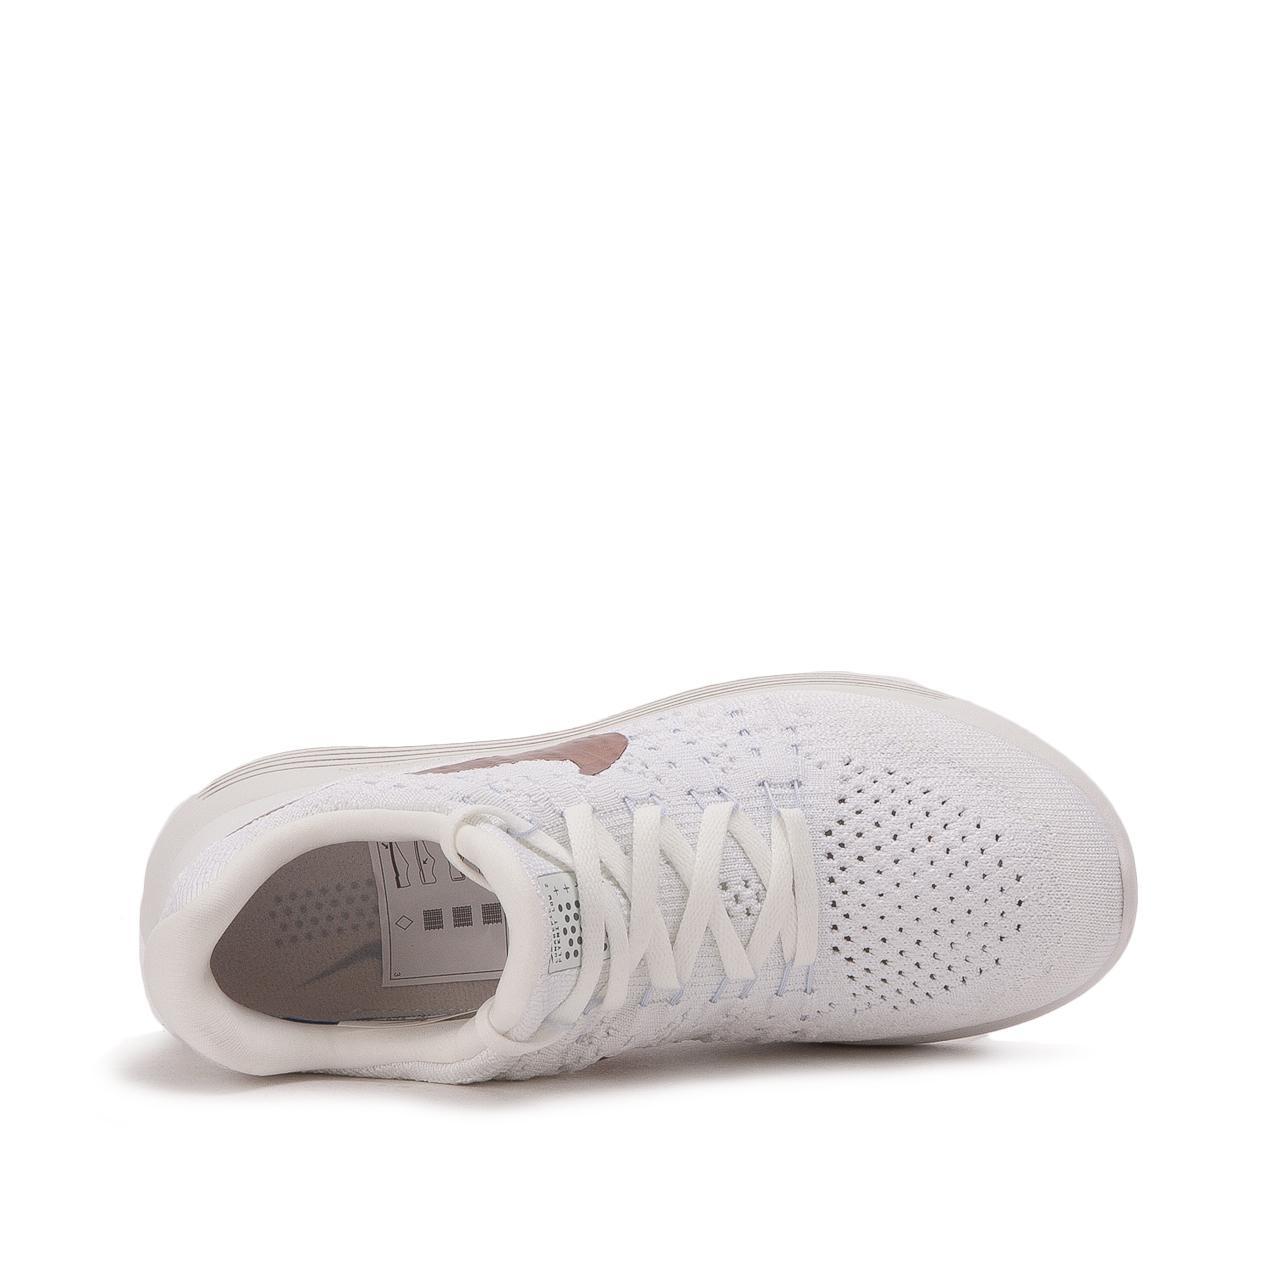 5e4e0e6ce92cf Nike White Nike Wmns Lunarepic Low Flyknit 2 X-plore for men